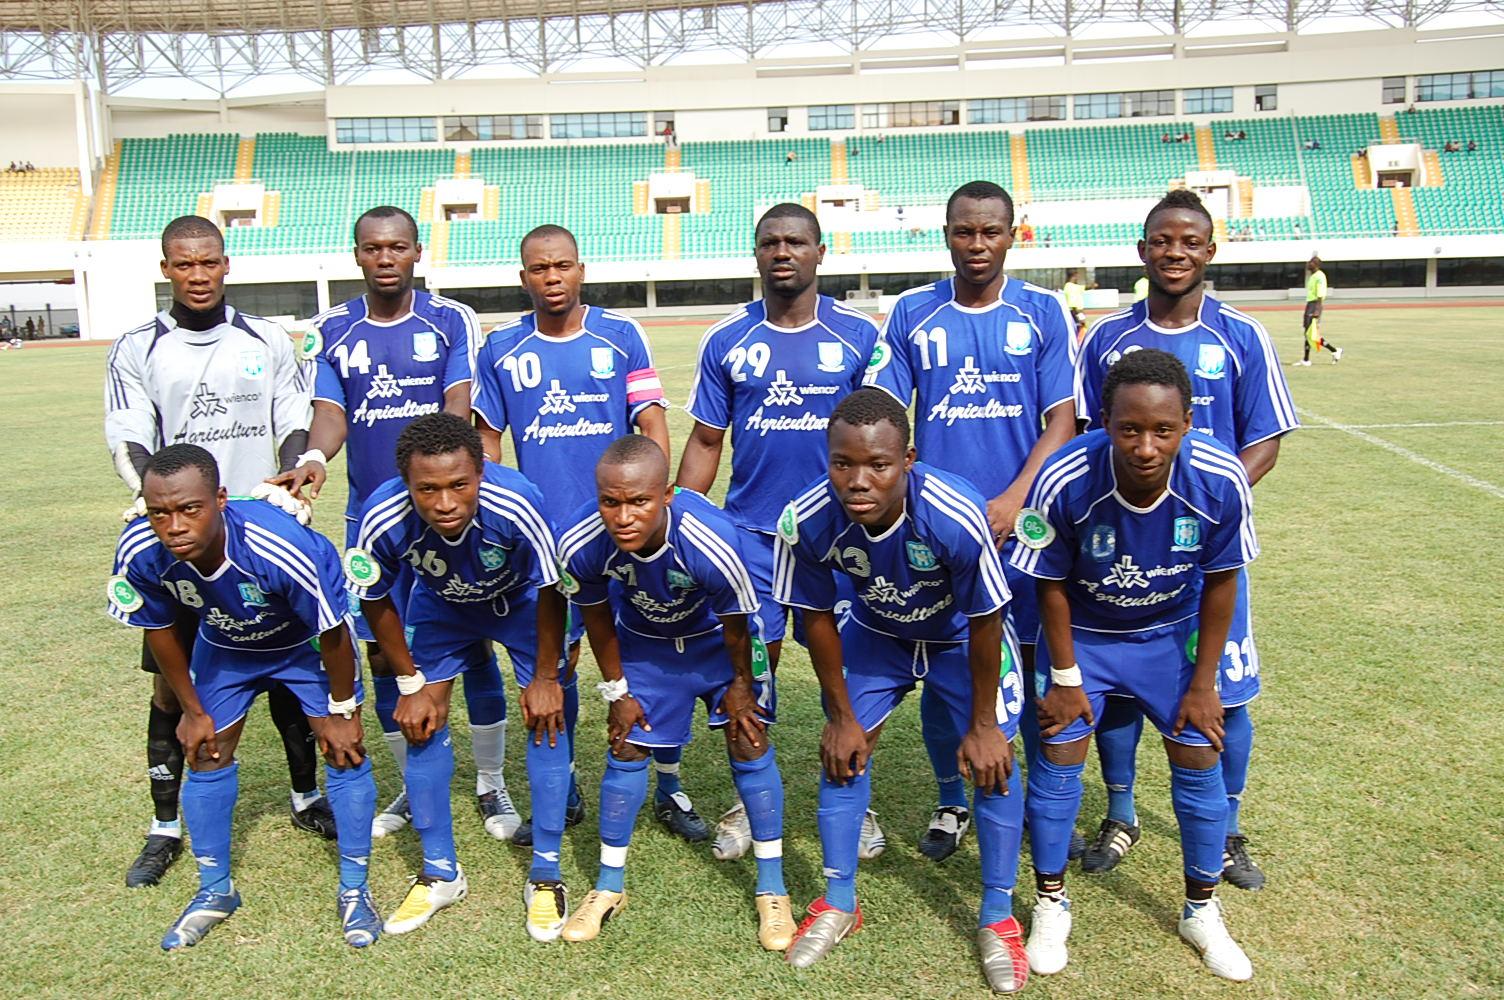 RTU won their opening play-off match against W.A United